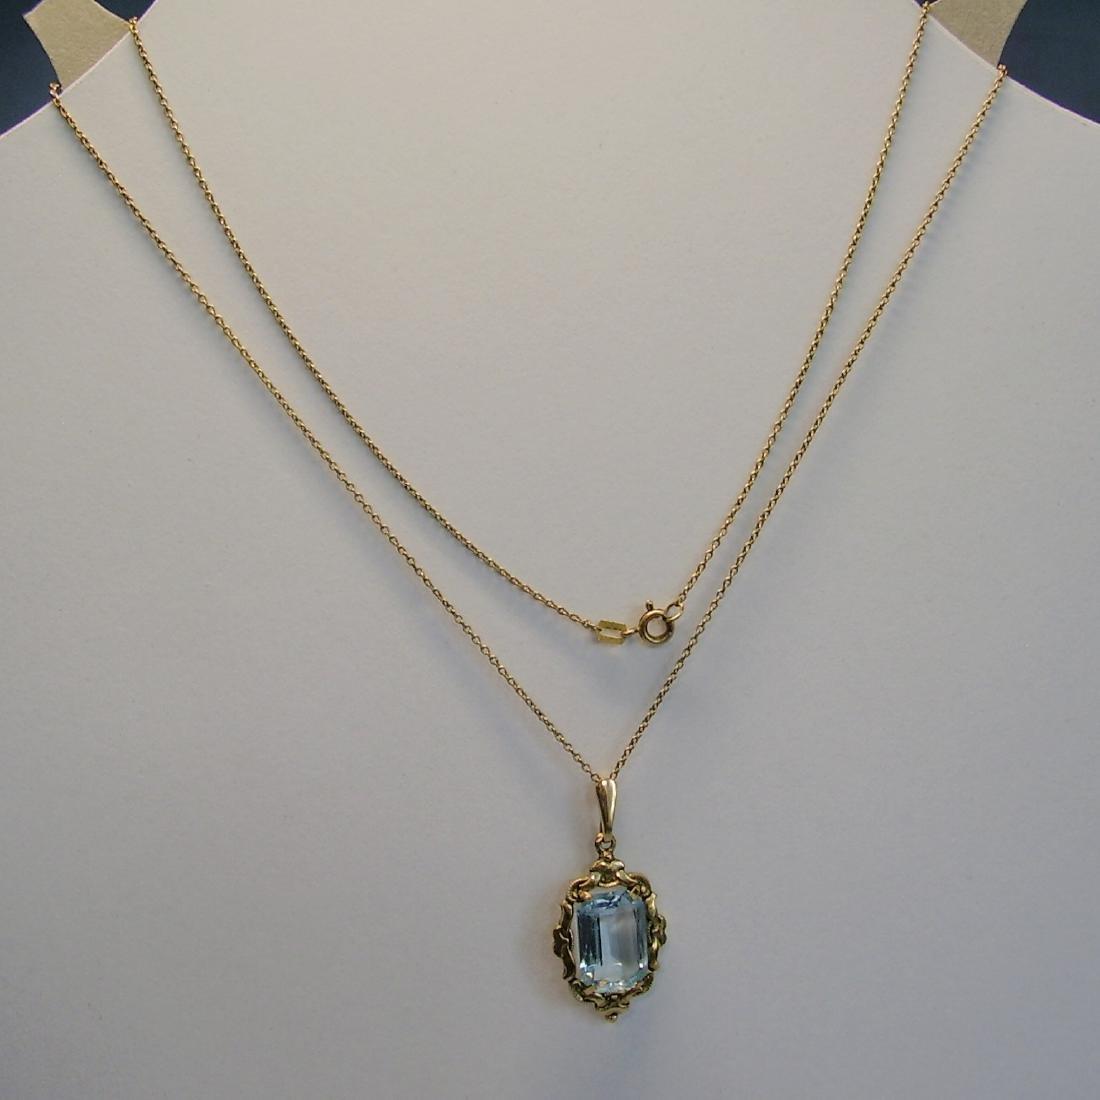 Art-Deco Pendant with chain